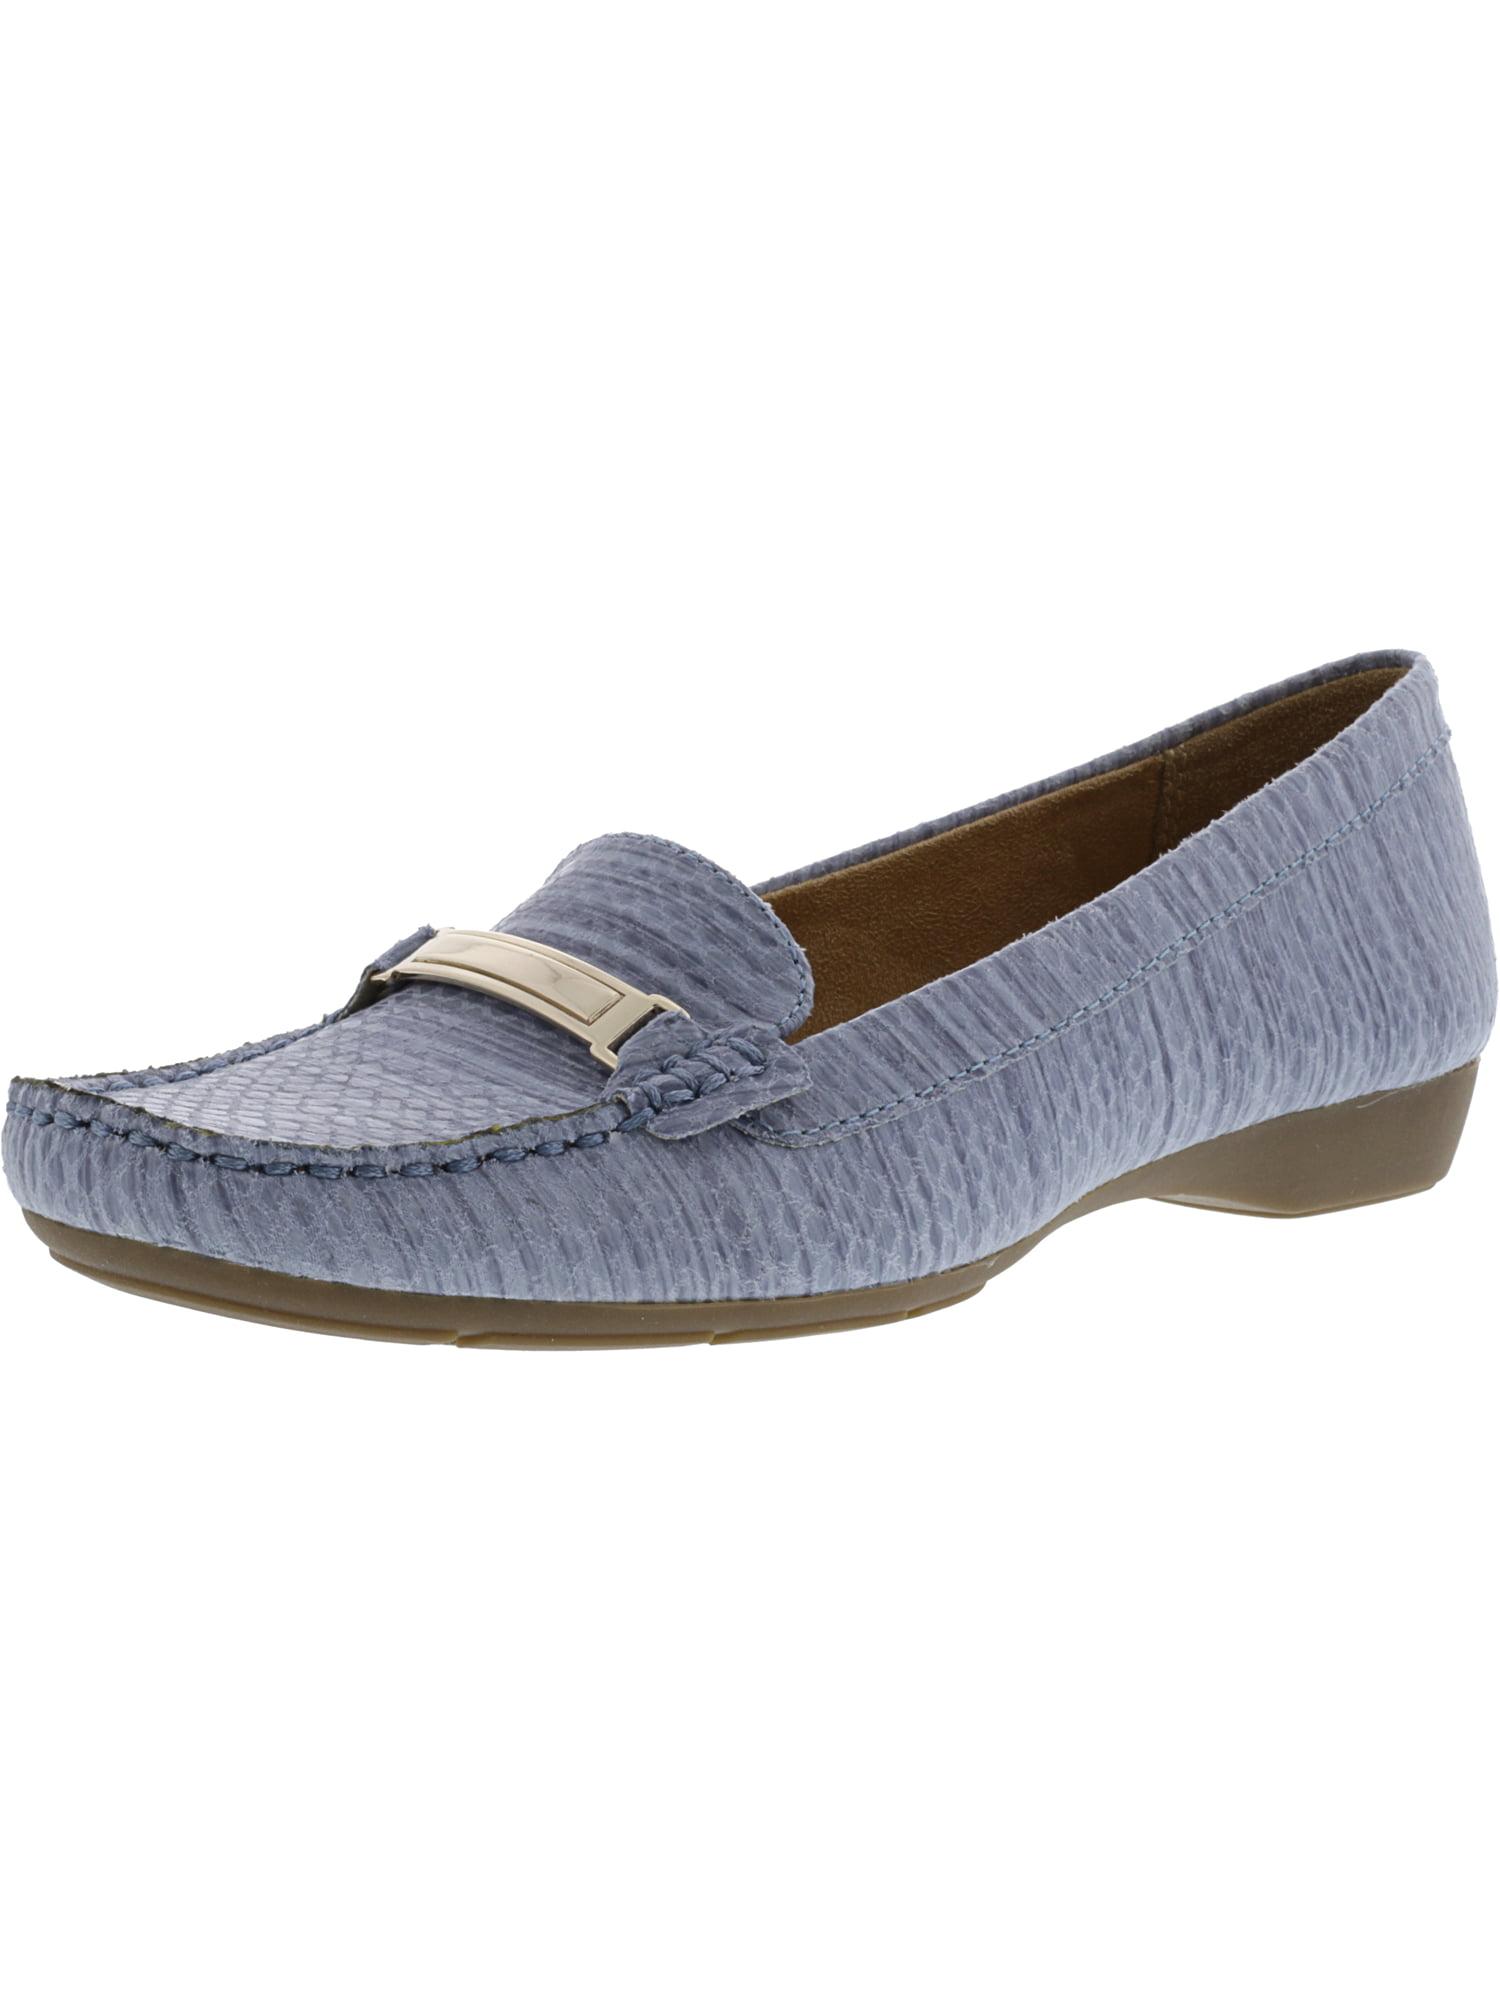 Naturalizer Women's Gadget Fabric Denim Print Slip-On Shoes 6.5M by Naturalizer